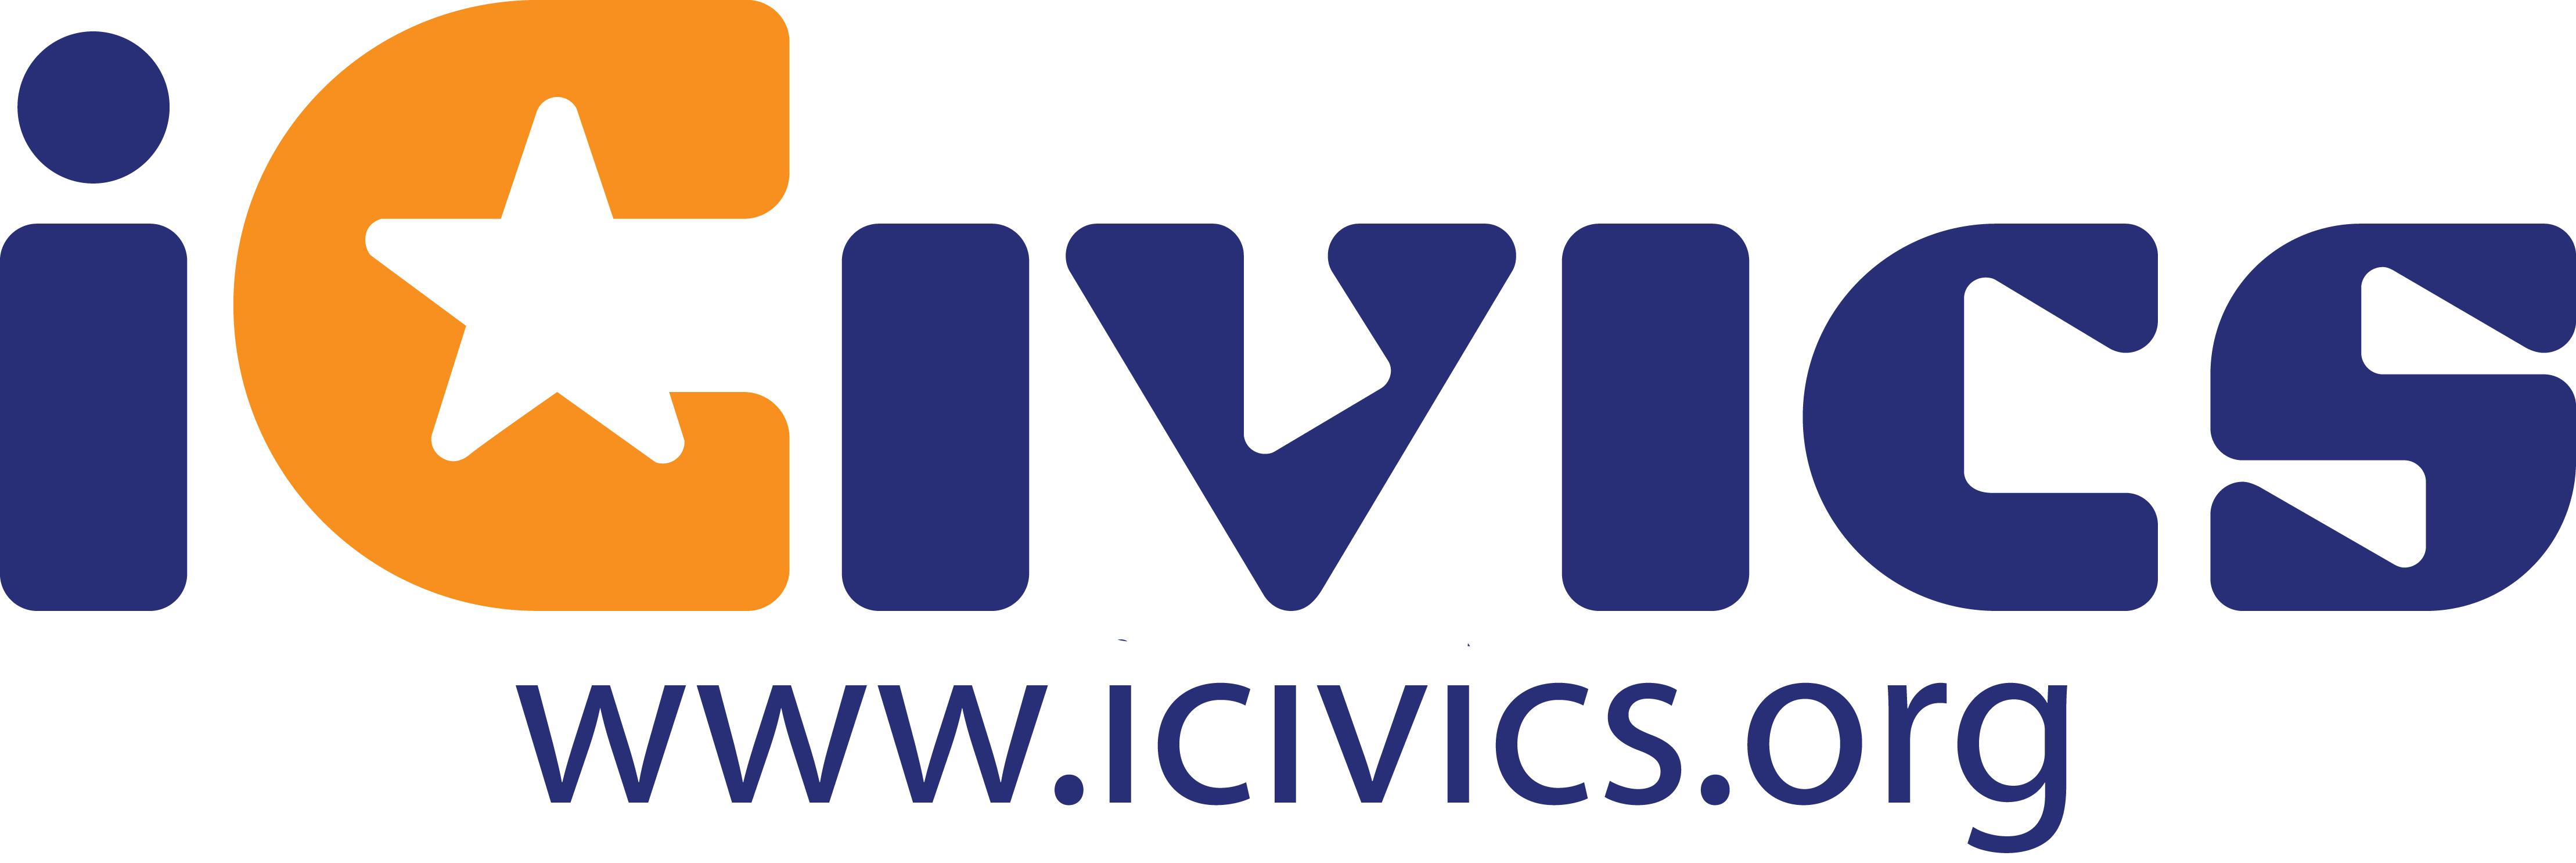 iCivics.org